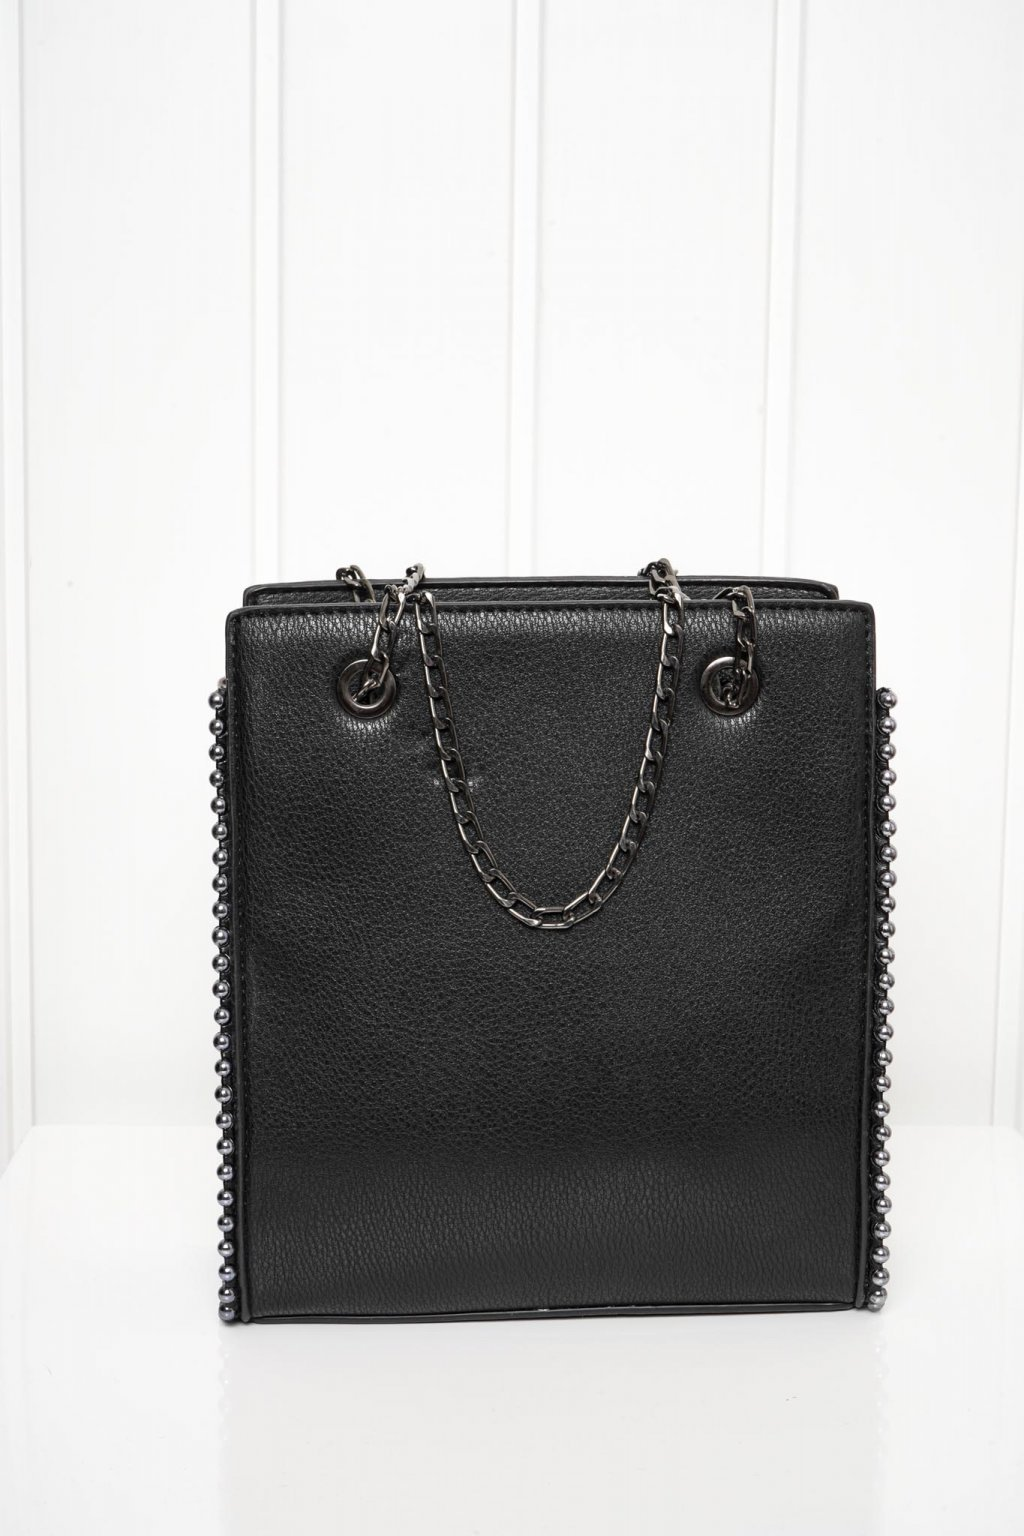 Kabelka, crossbody, ruksak, shopping bag, shopperka, 195